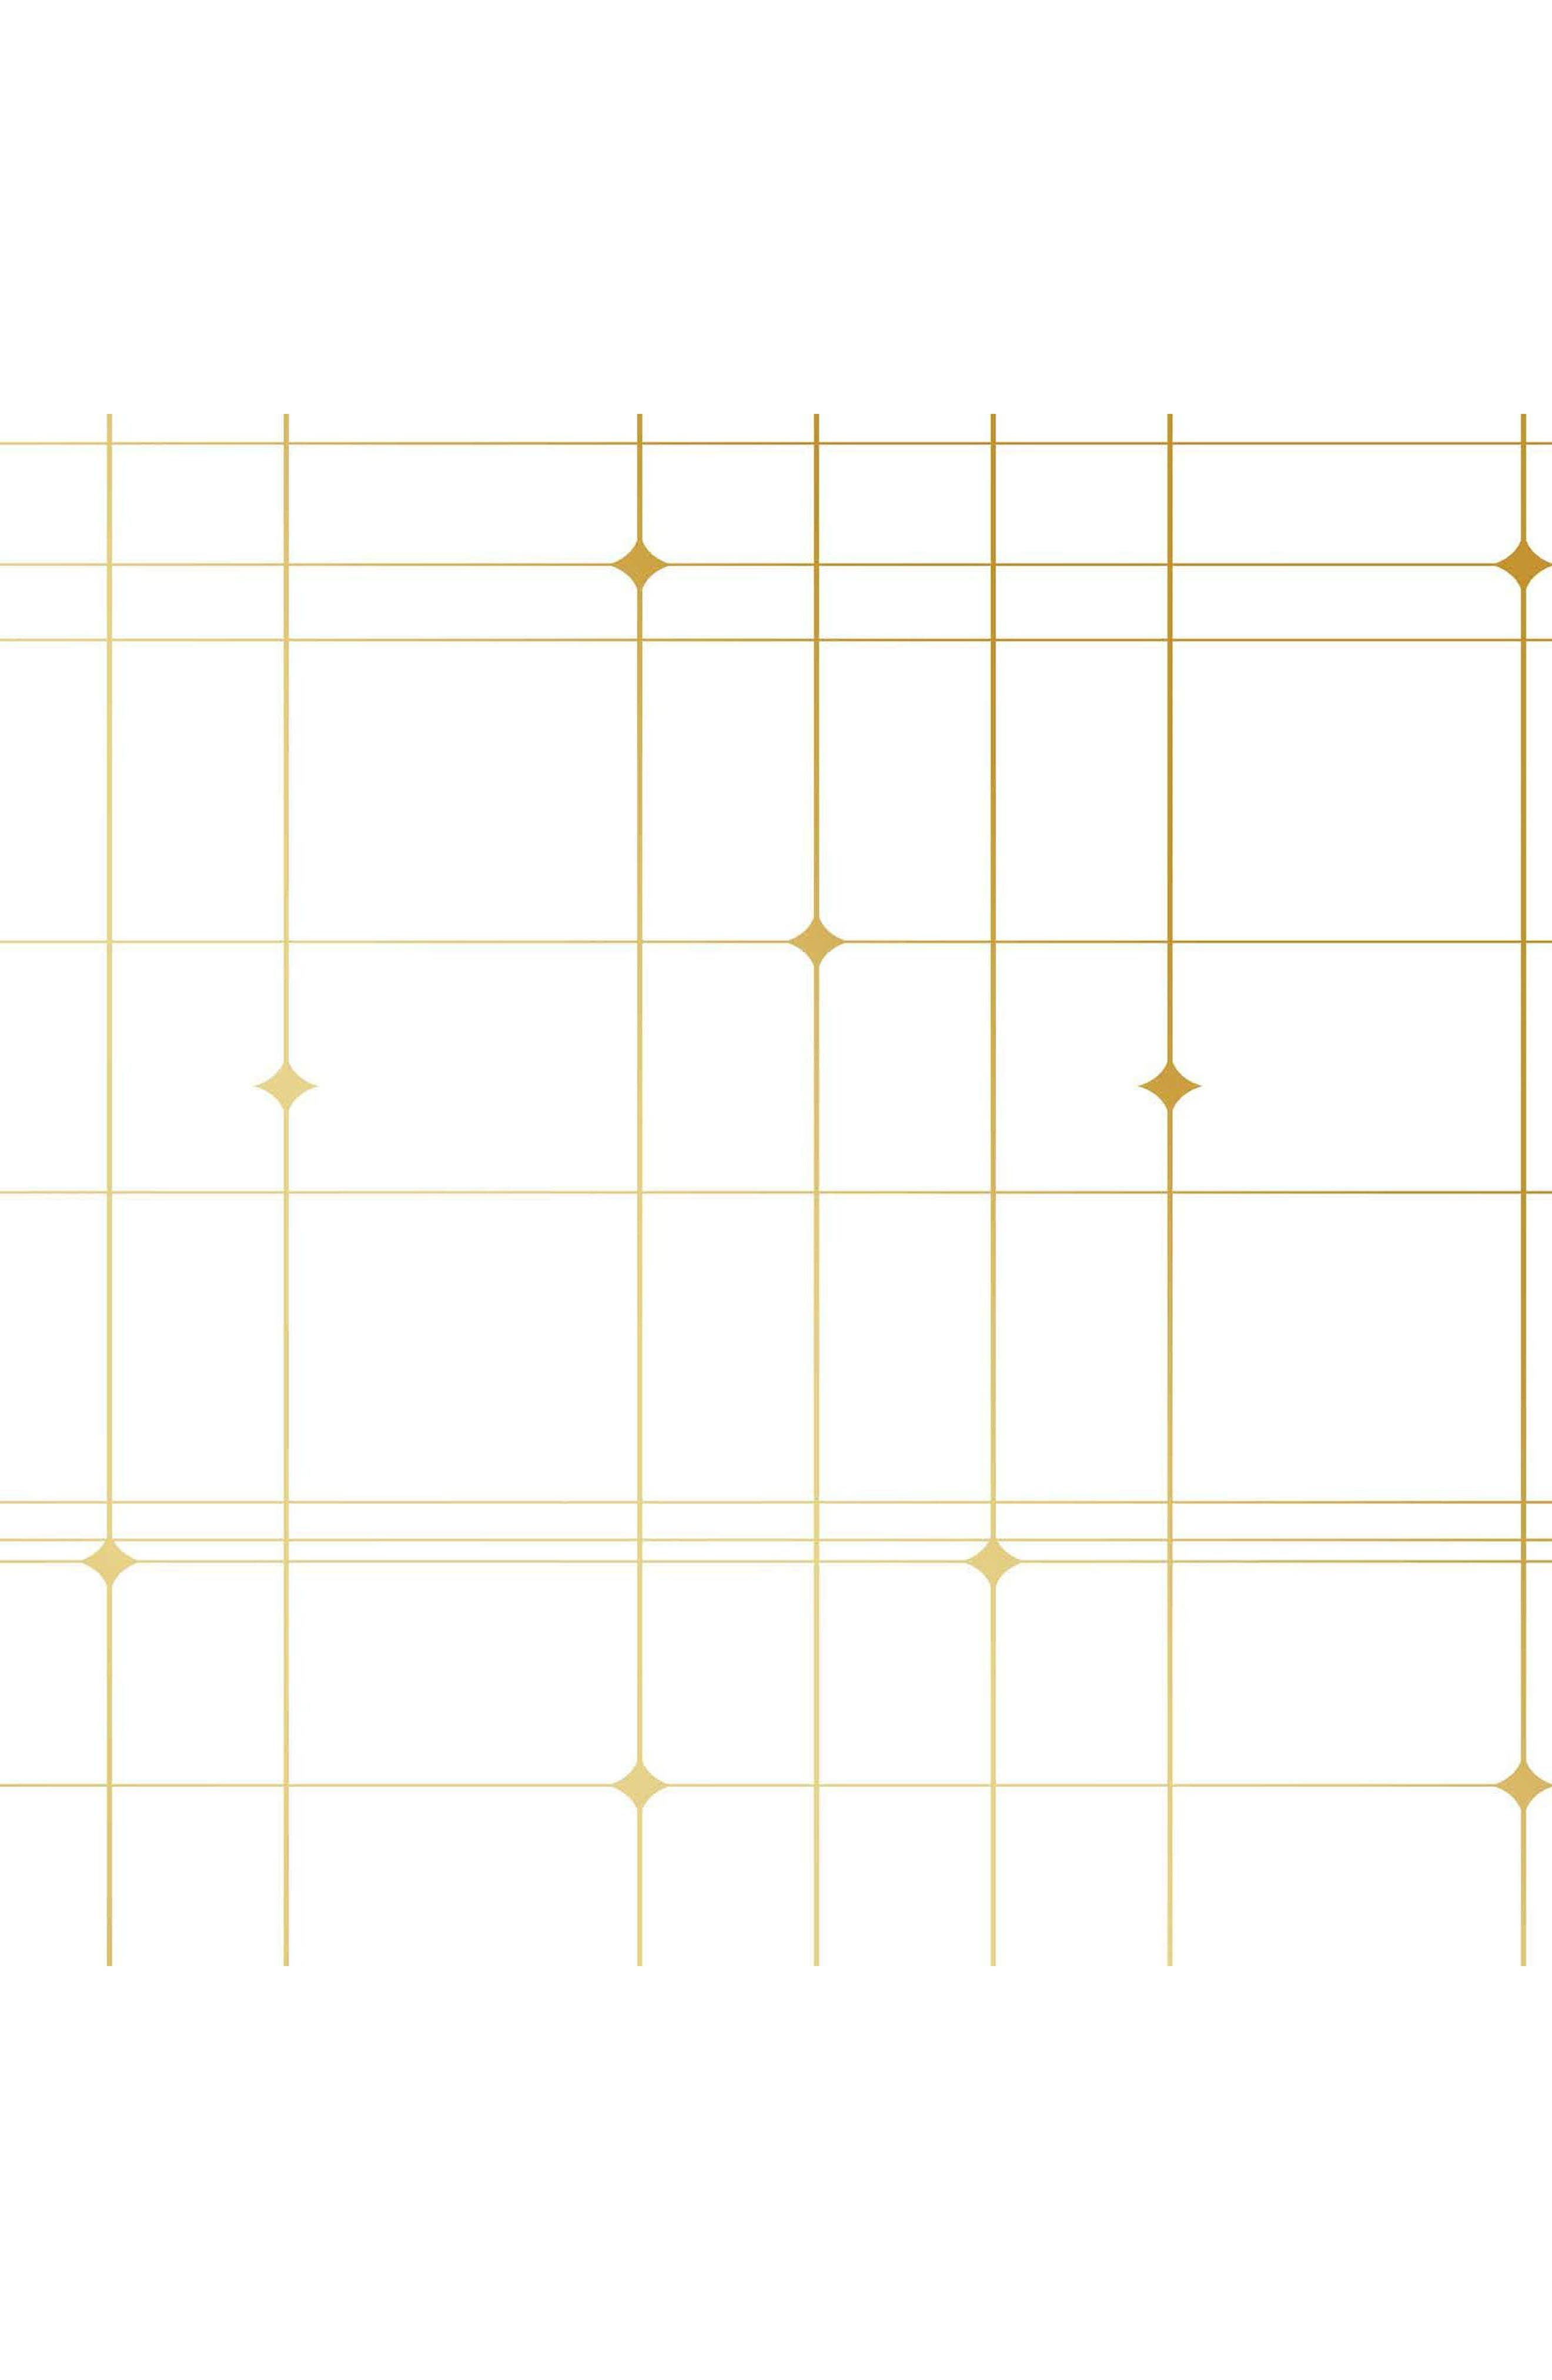 Thermoscad Self-Adhesive Vinyl Wallpaper,                         Main,                         color,